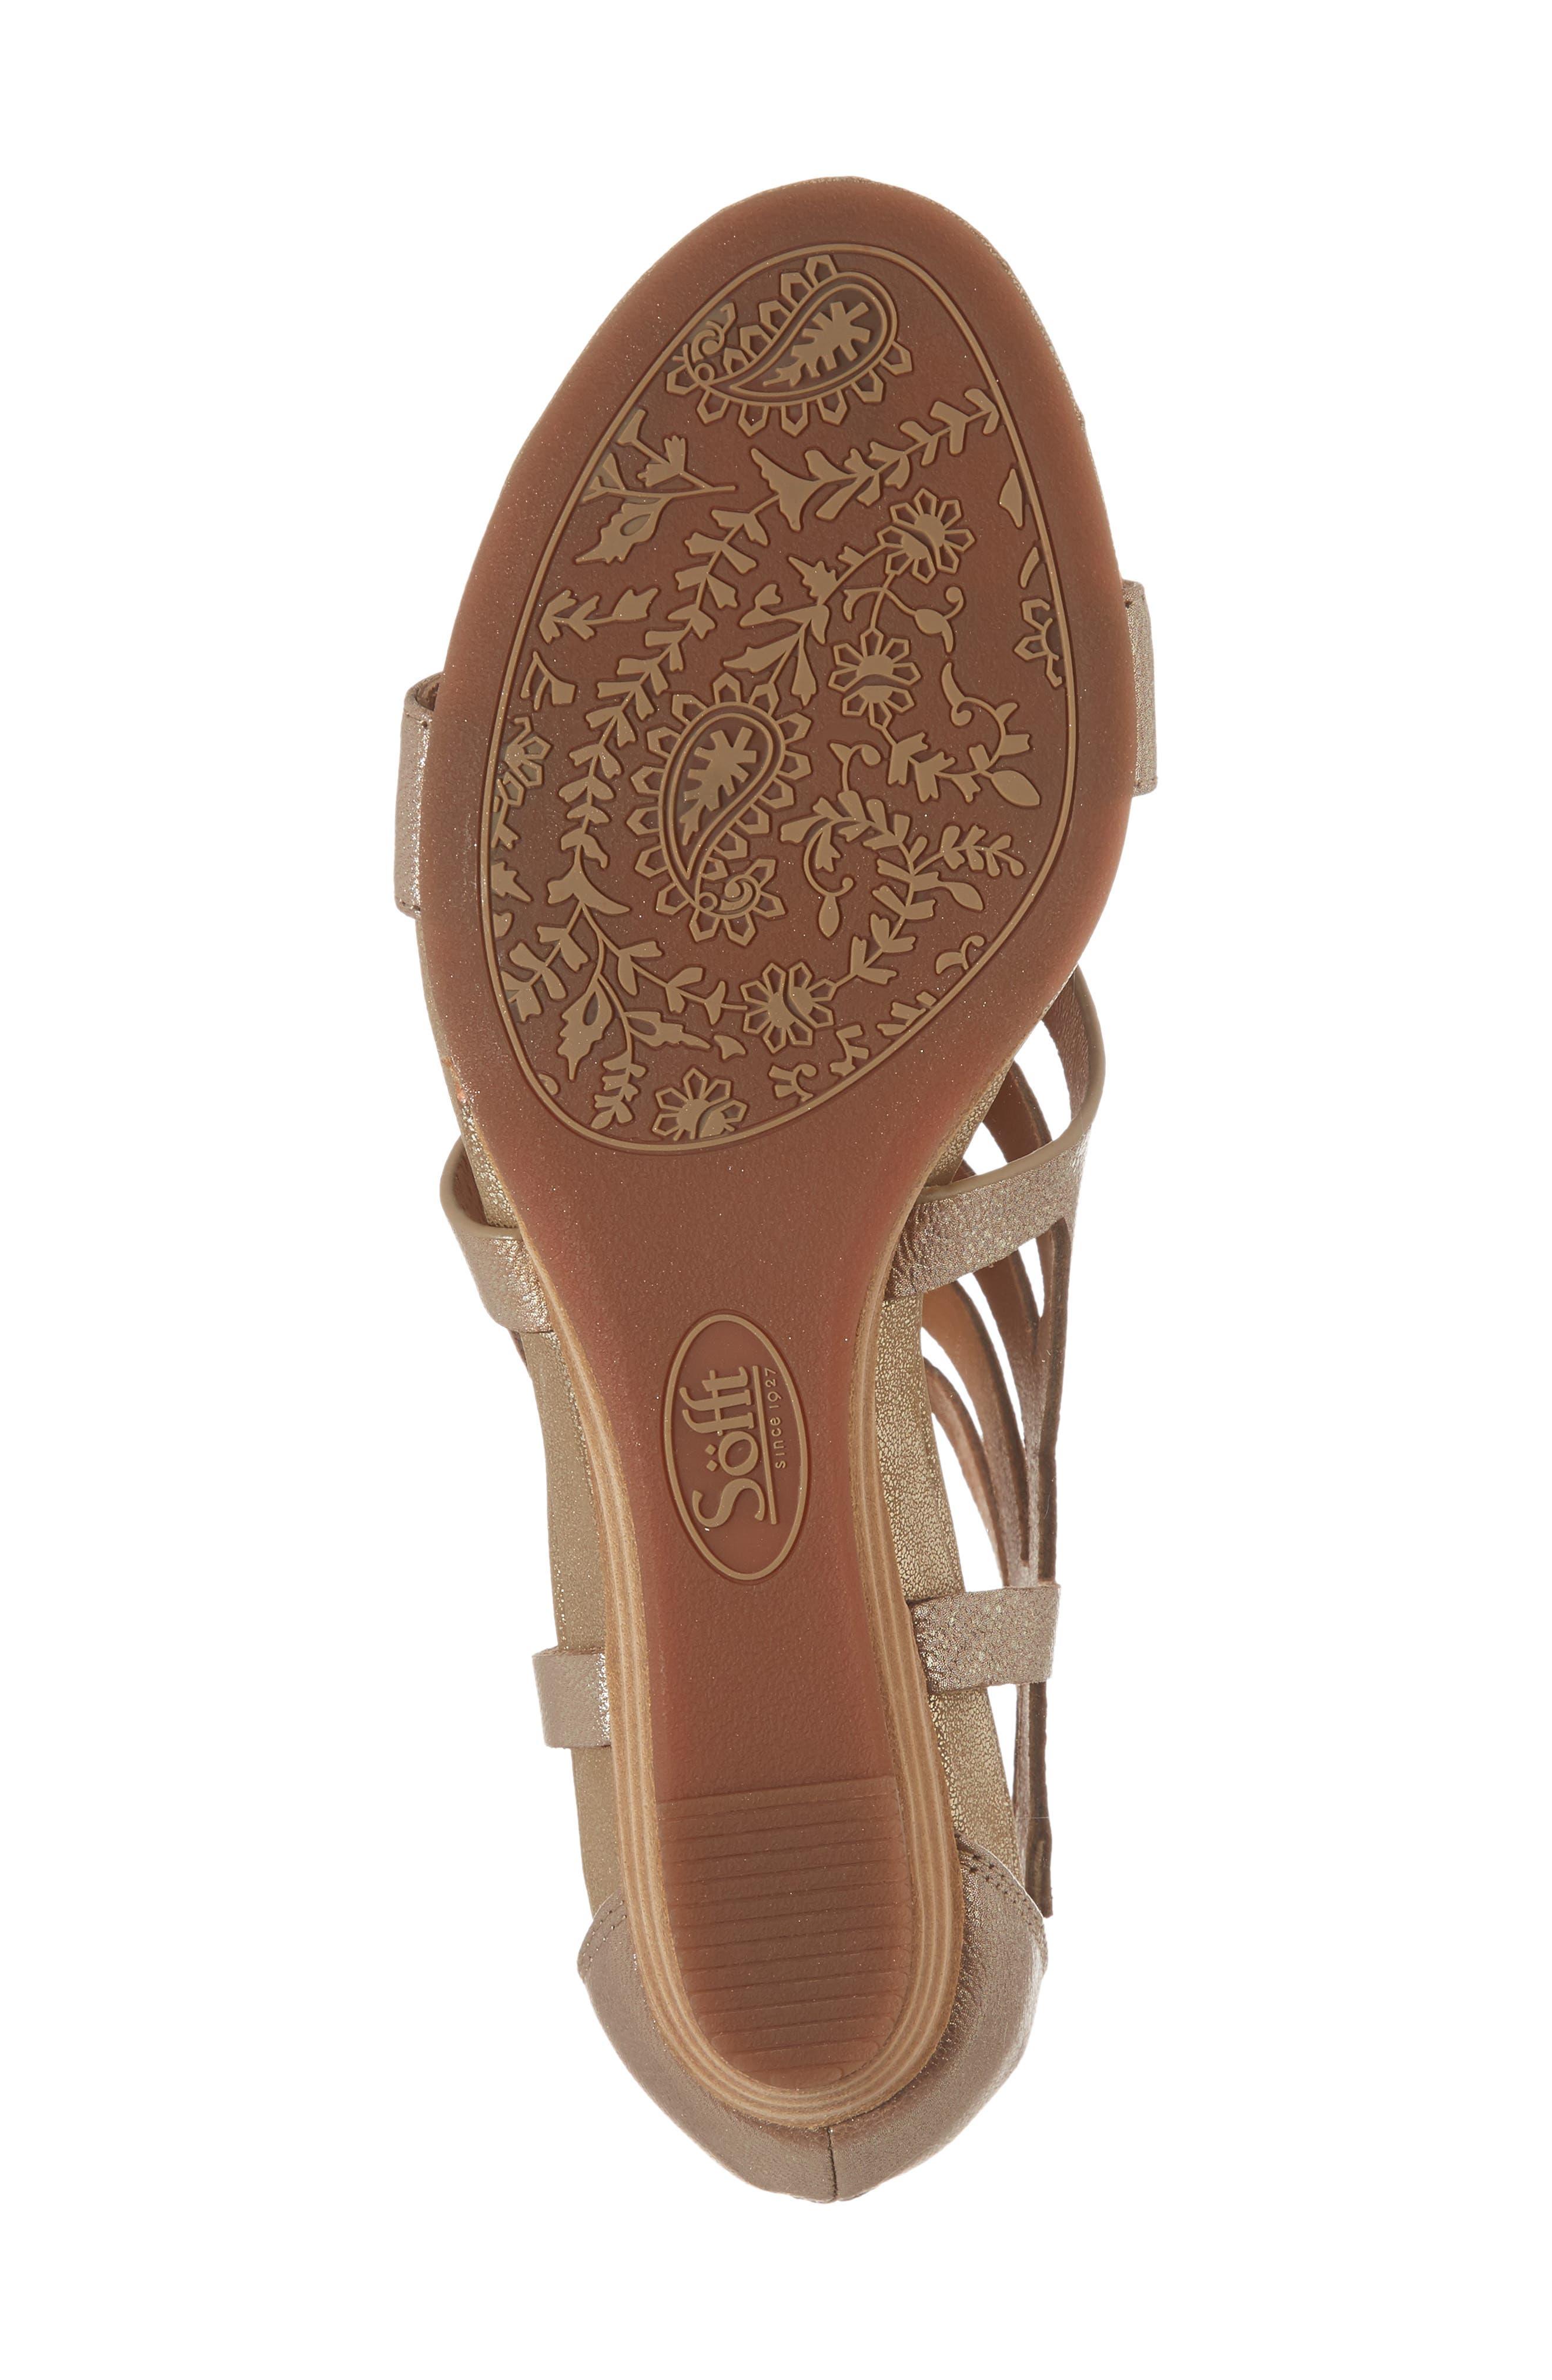 Ravello Wedge Sandal,                             Alternate thumbnail 6, color,                             Satin Gold Leather